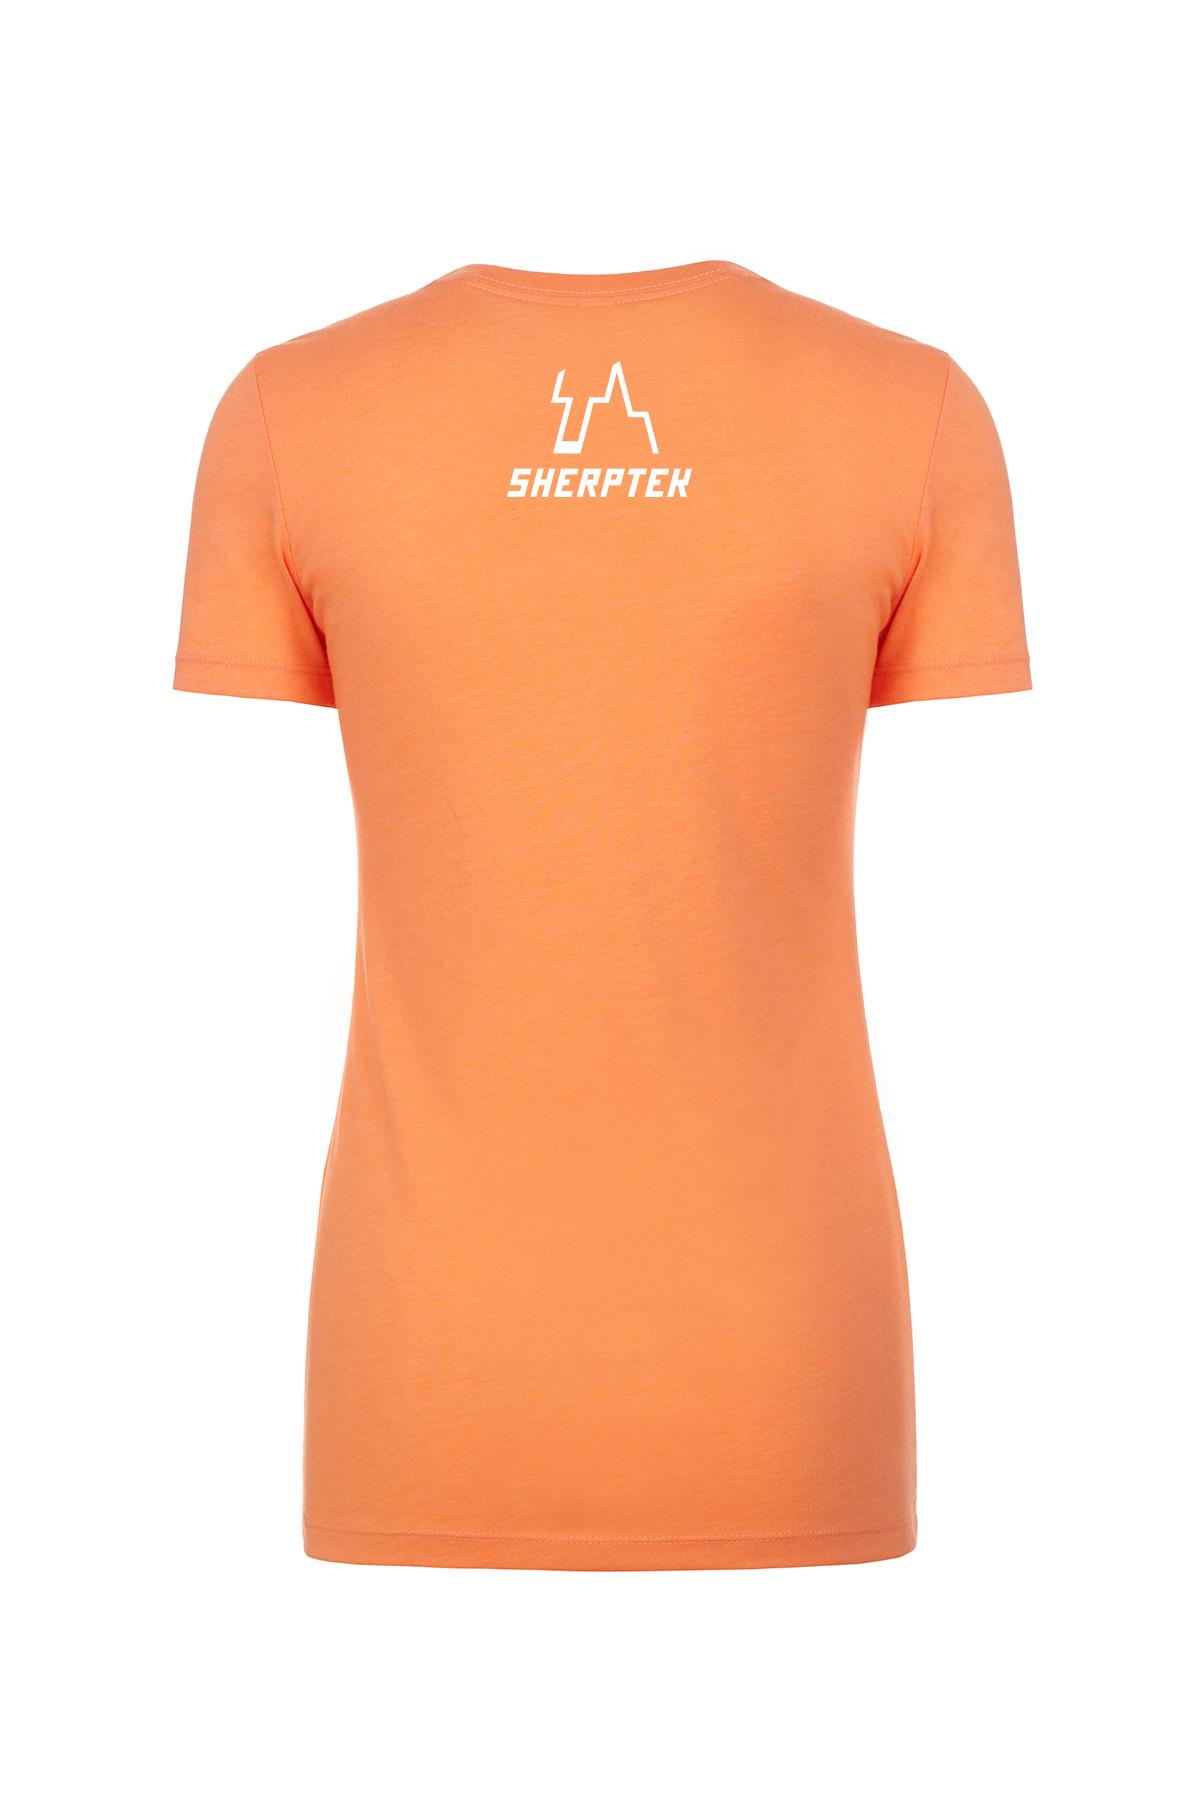 Womens Back - Vintage Light Orange.jpg